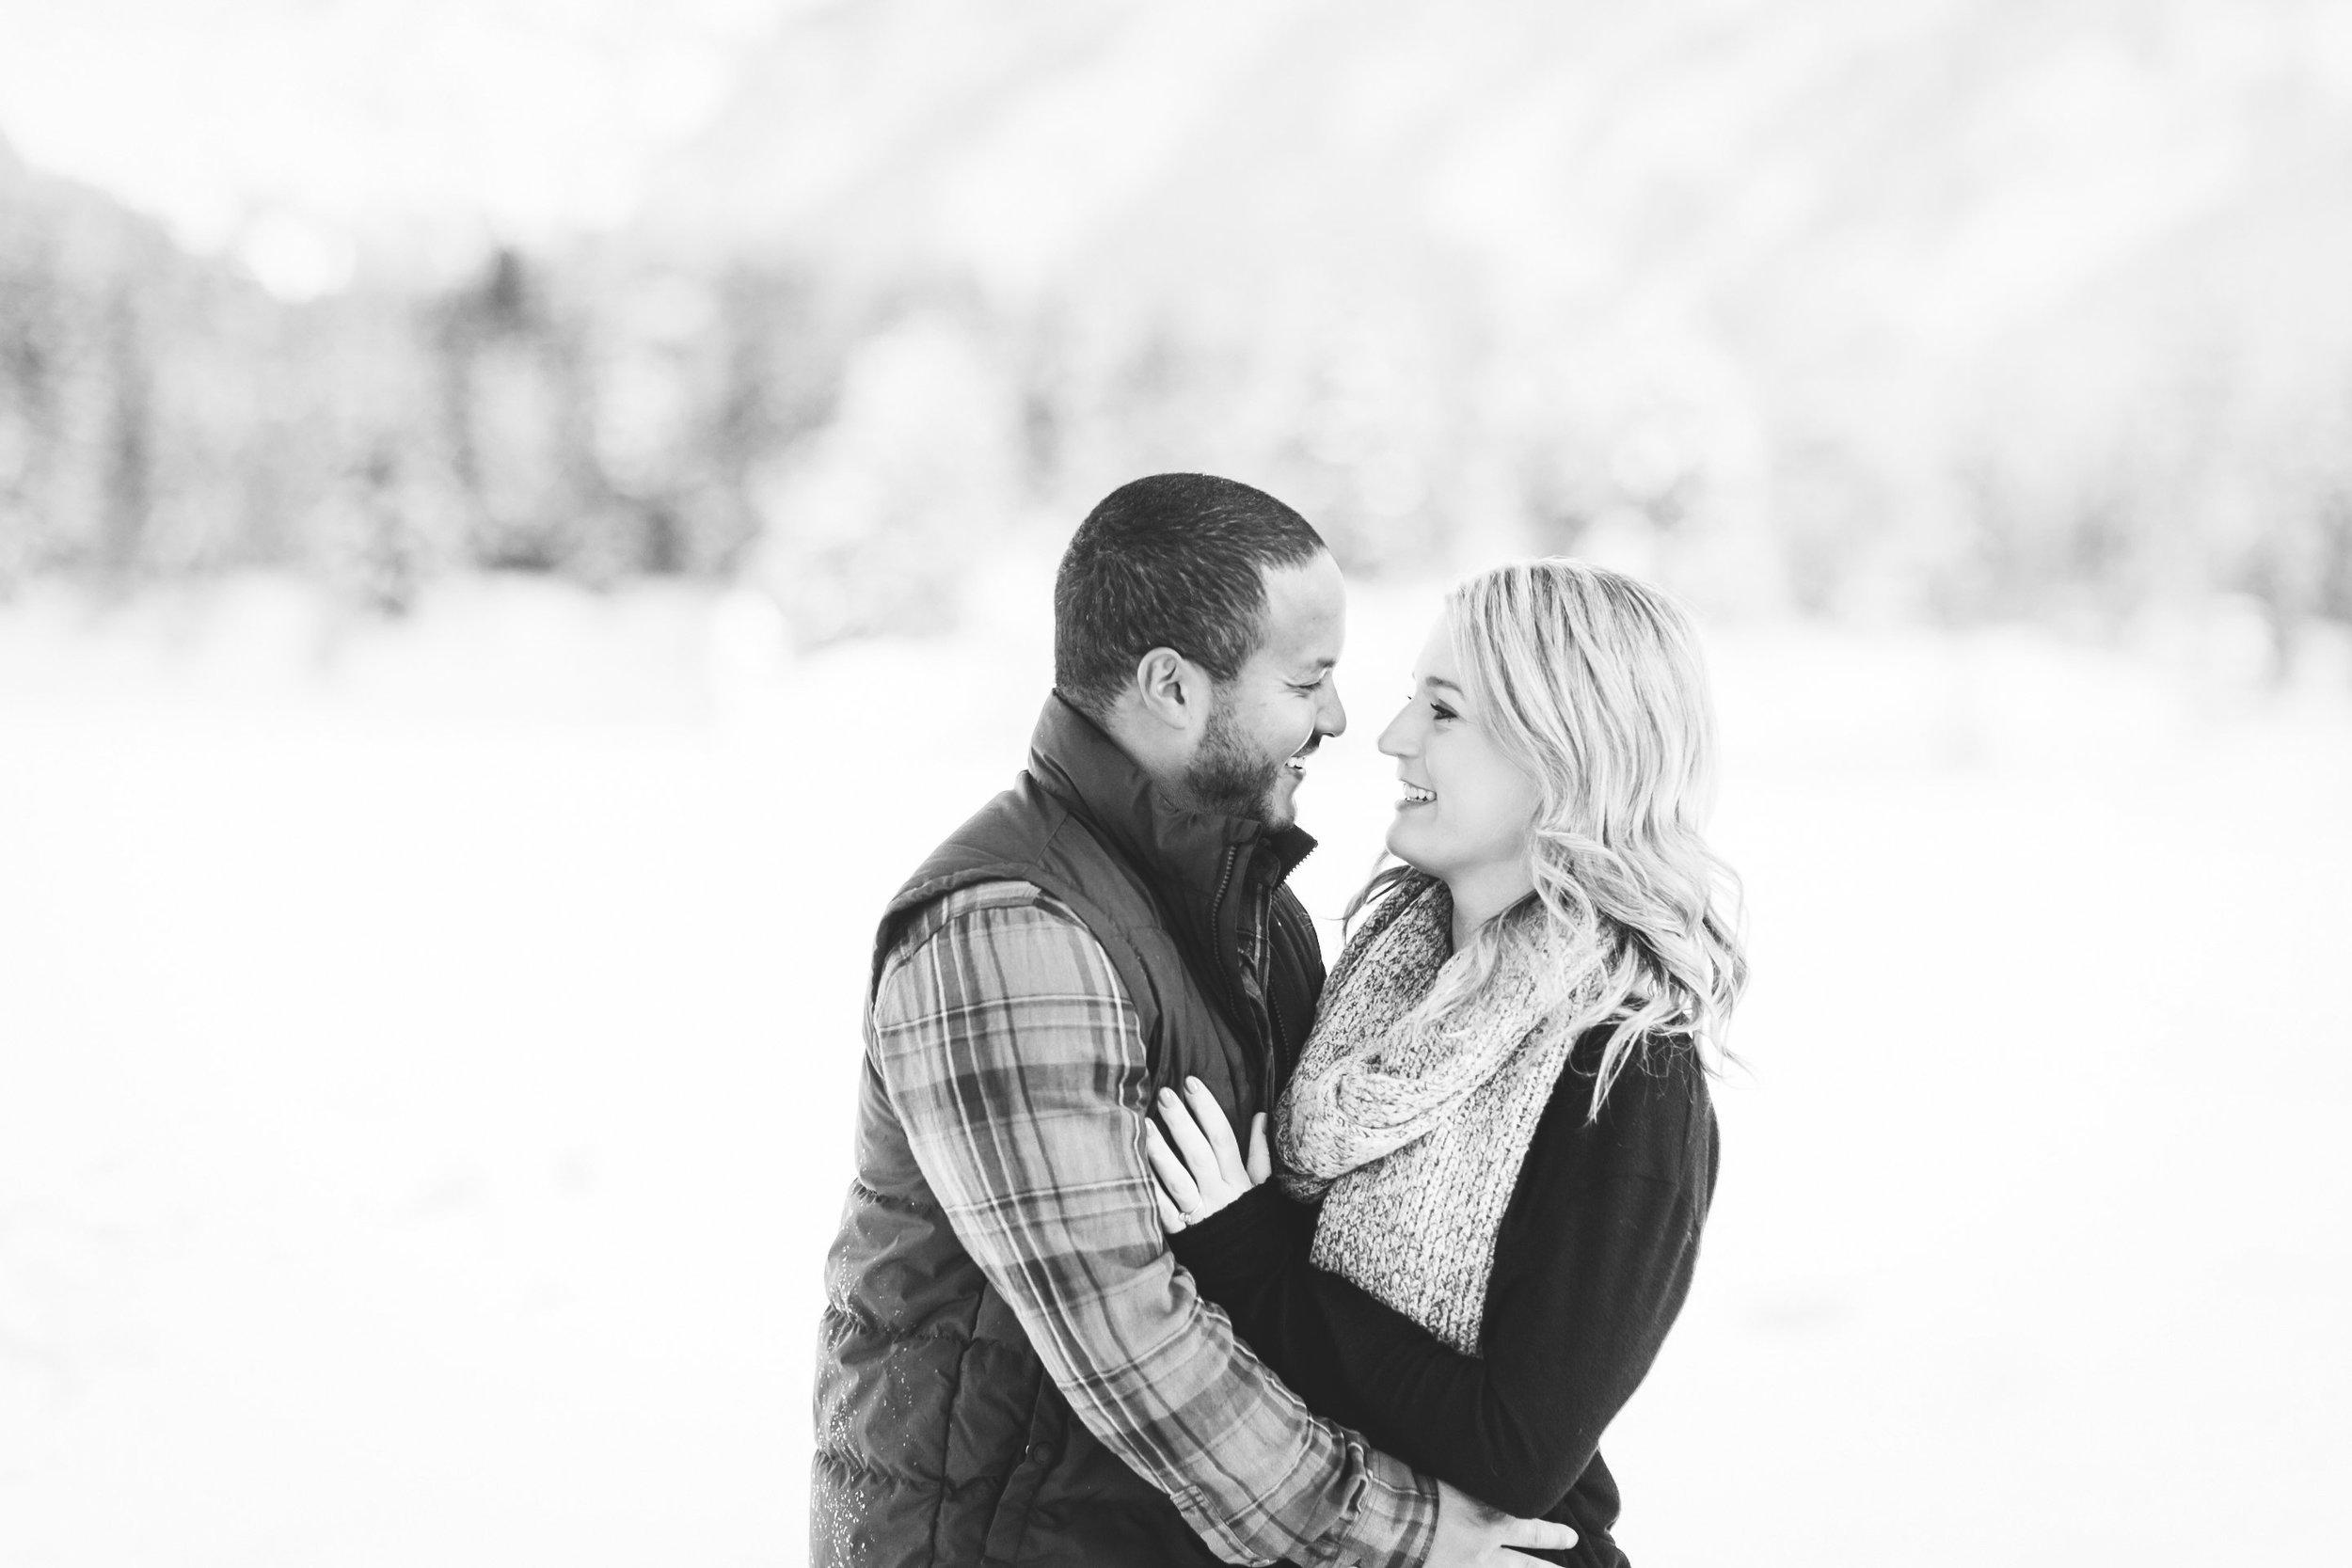 Seattle Engagement Photos | Winter Engagement Photos | Wedding Wise | Seattle Wedding Planner | Rachel Howerton Photography